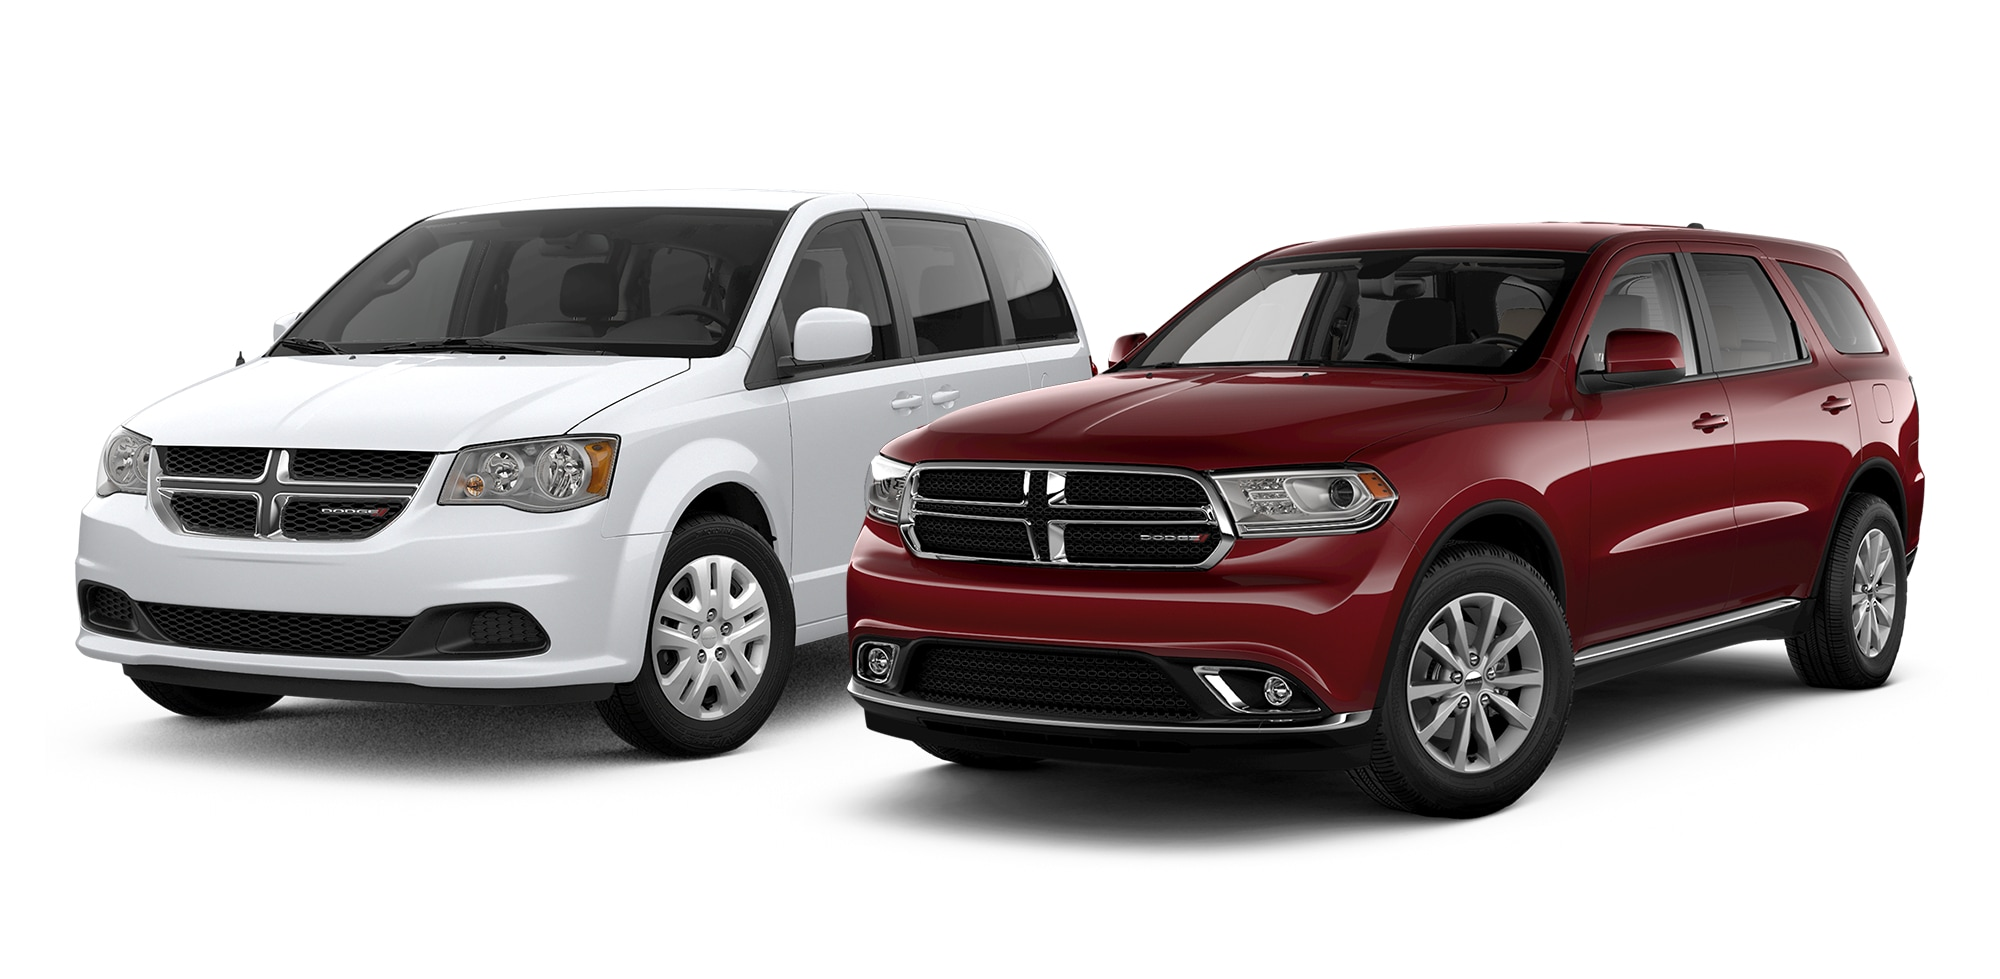 Dodge Suv List >> Blog Post List South Hills Chrysler Dodge Jeep Ram Fiat